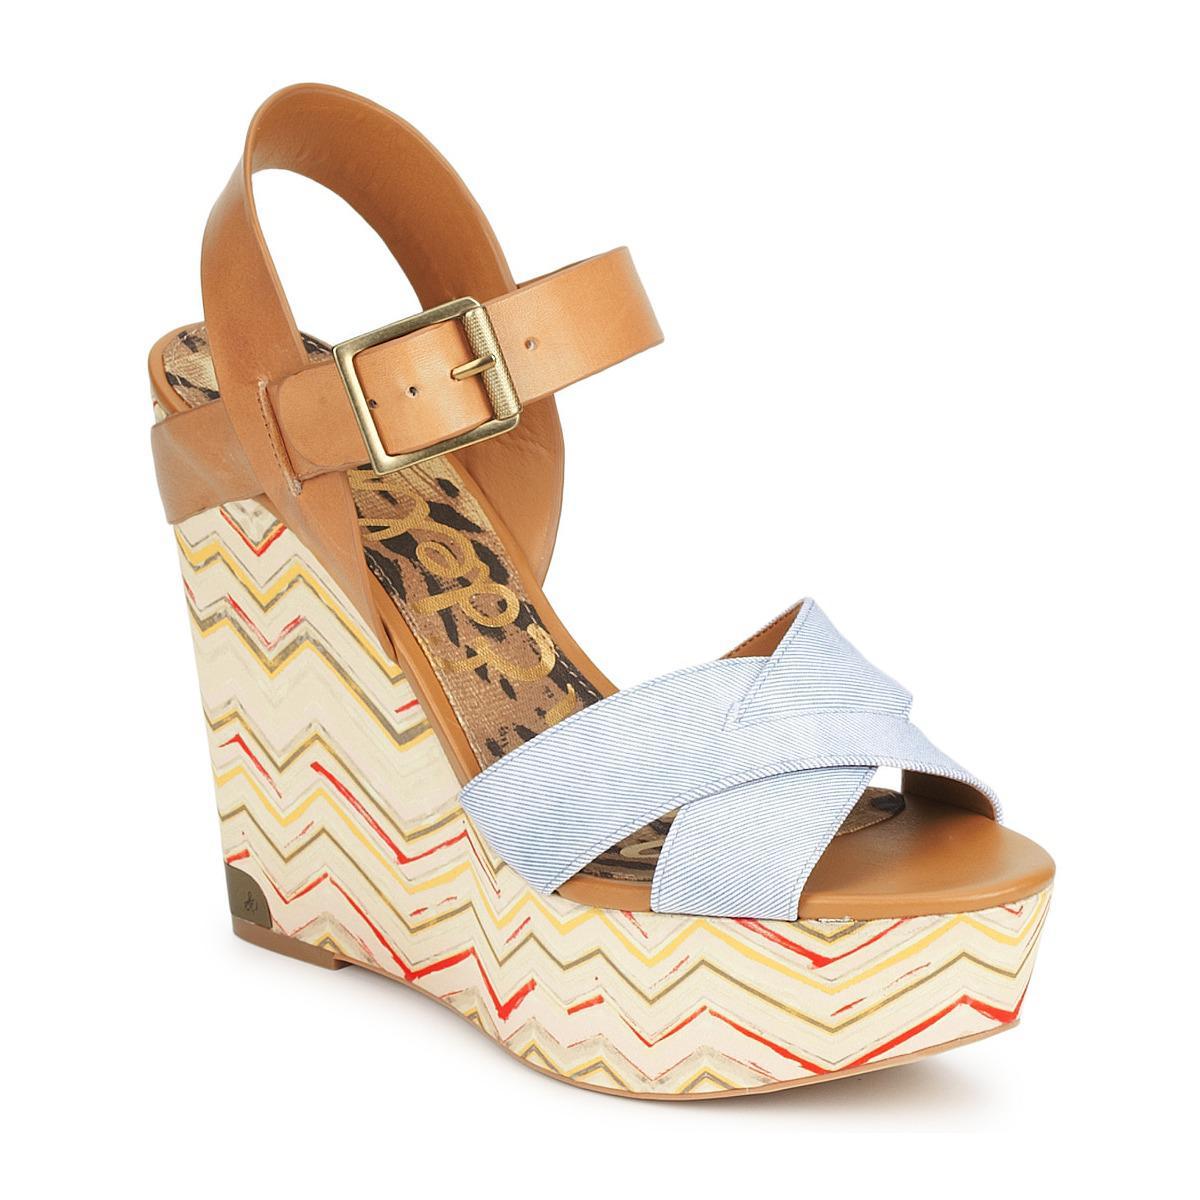 Sam Edelman SASHA women's Sandals in Sale Latest Collections 8nCW58N8tc